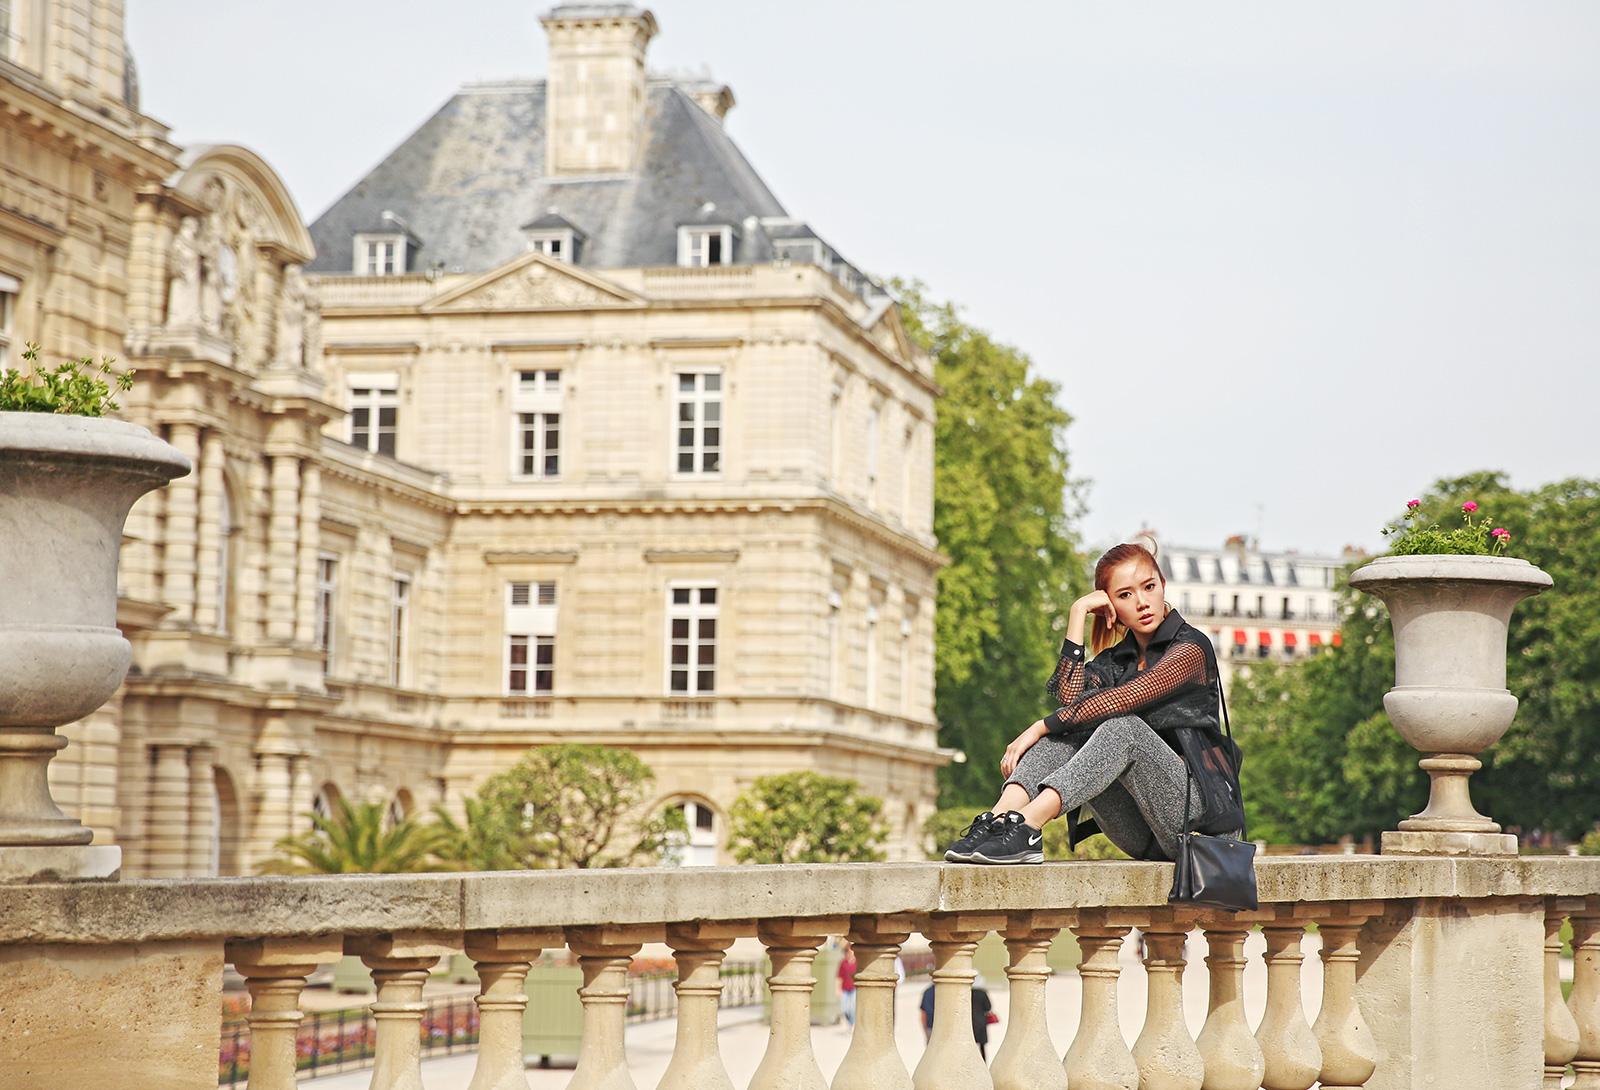 Styligion at Jardin de Luxembourg | www.itscamilleco.com